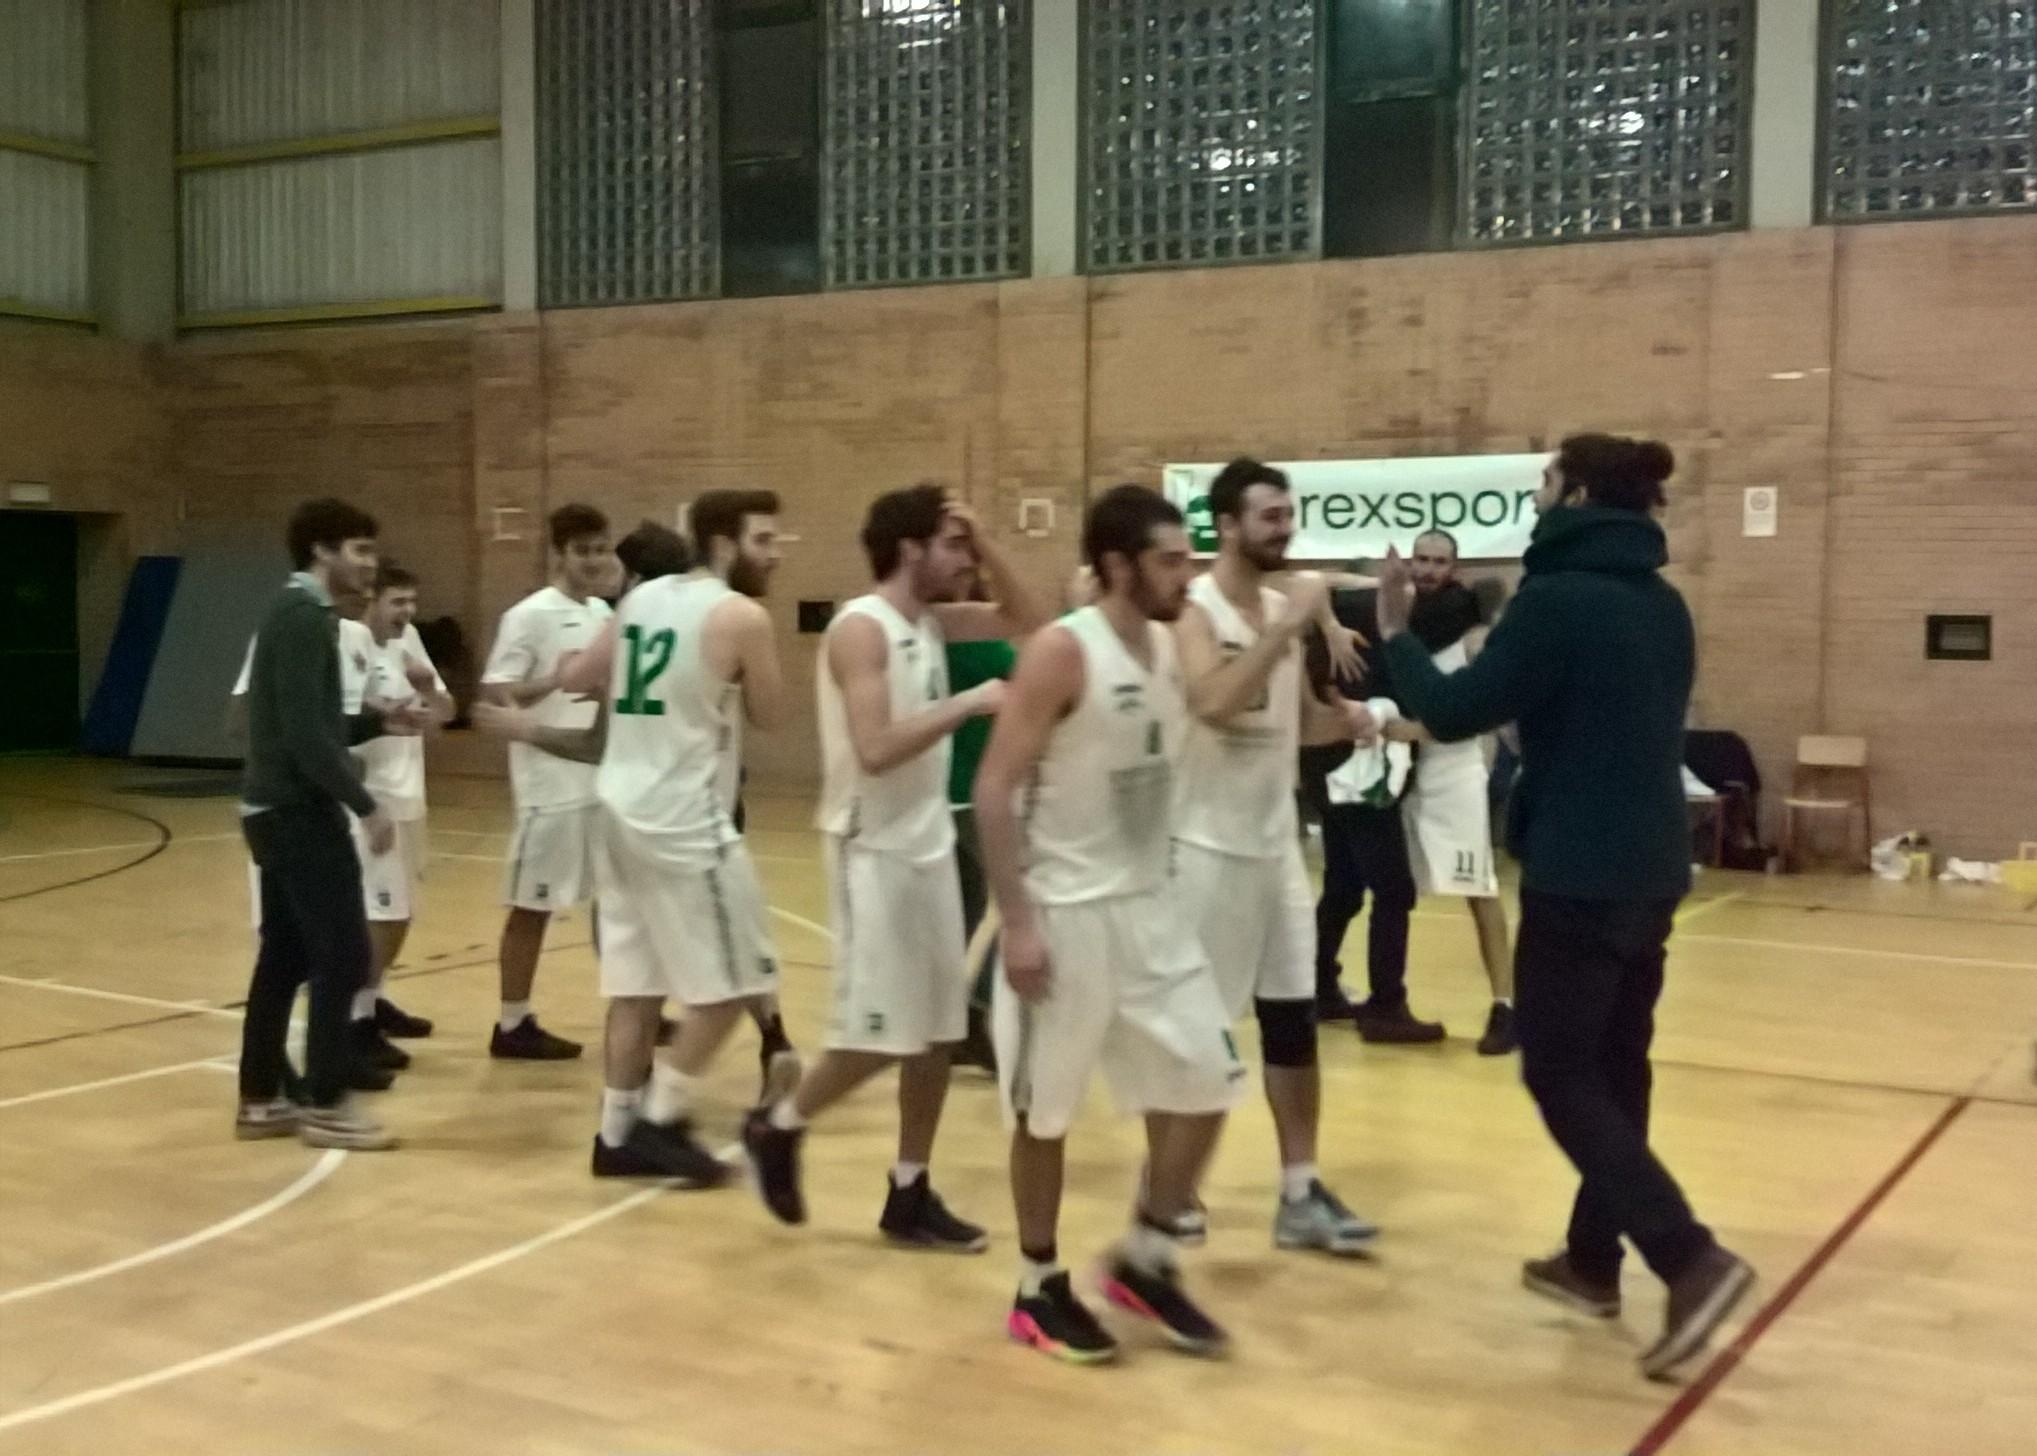 9°g. Lorex Sport Valdisieve-NBA Altopascio 86-83